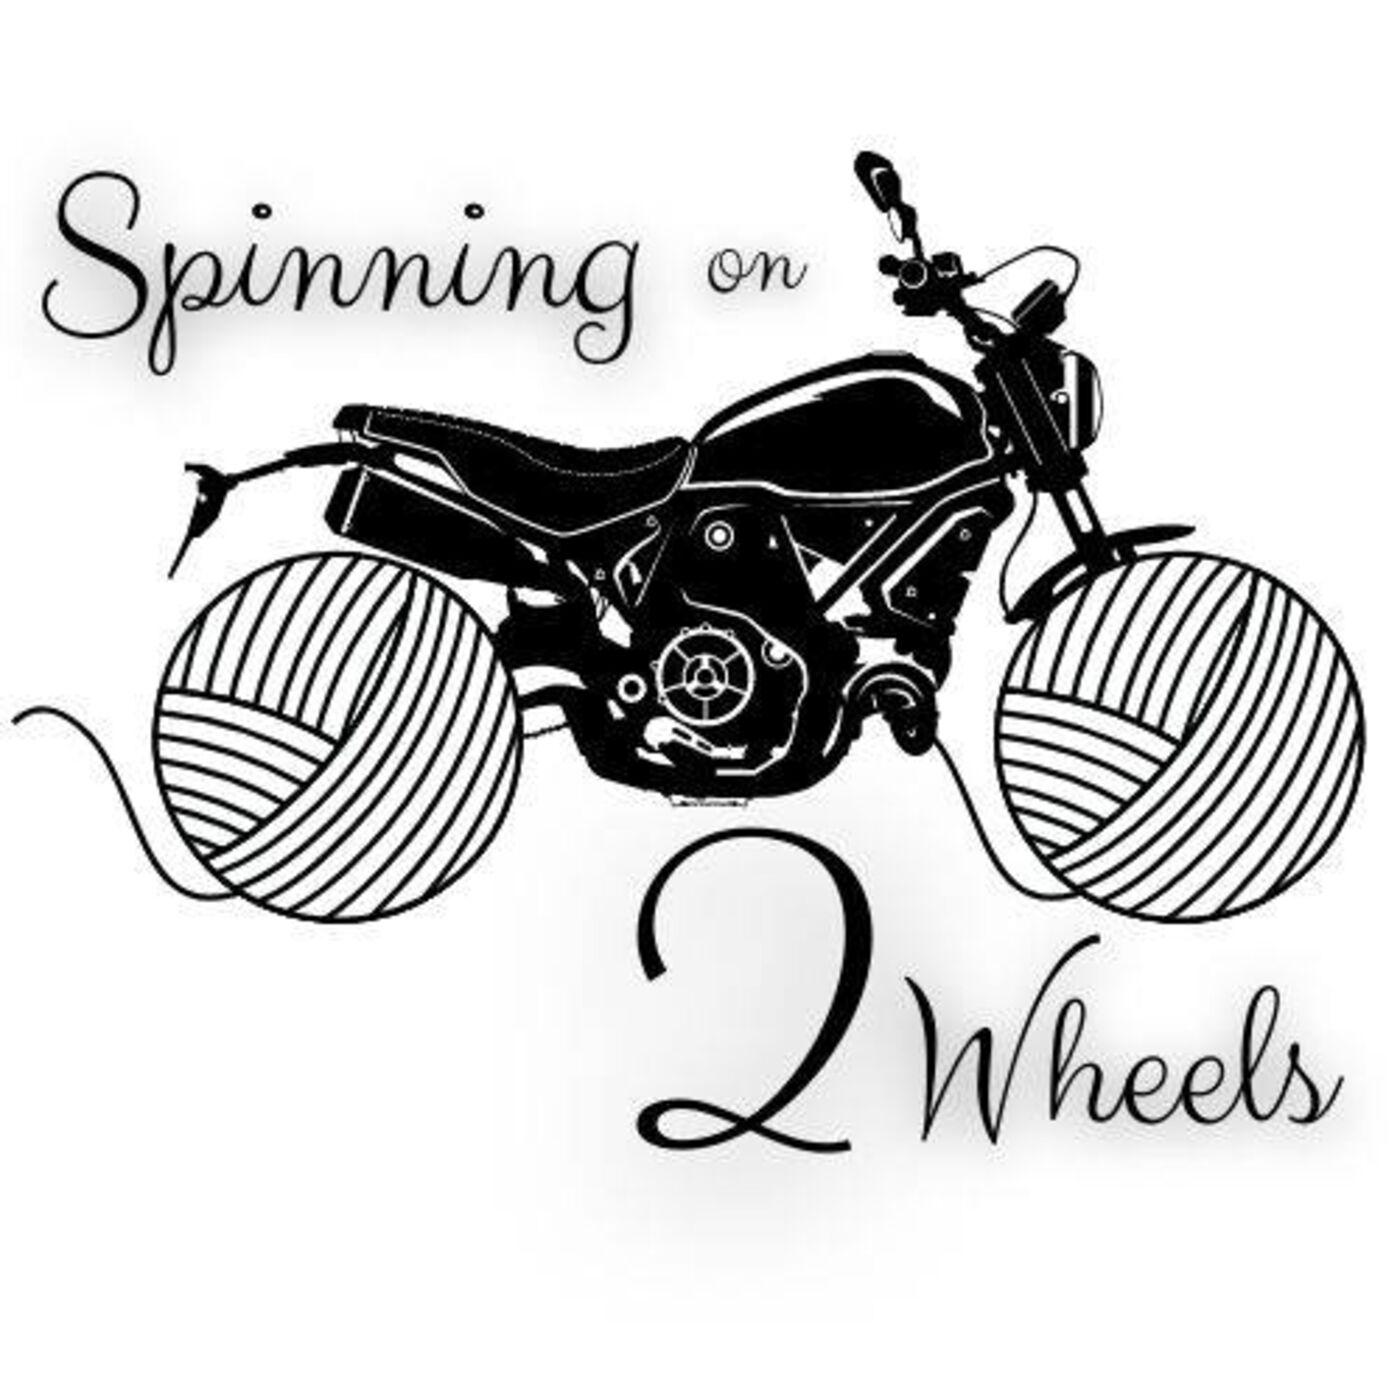 Spinning On 2 Wheels